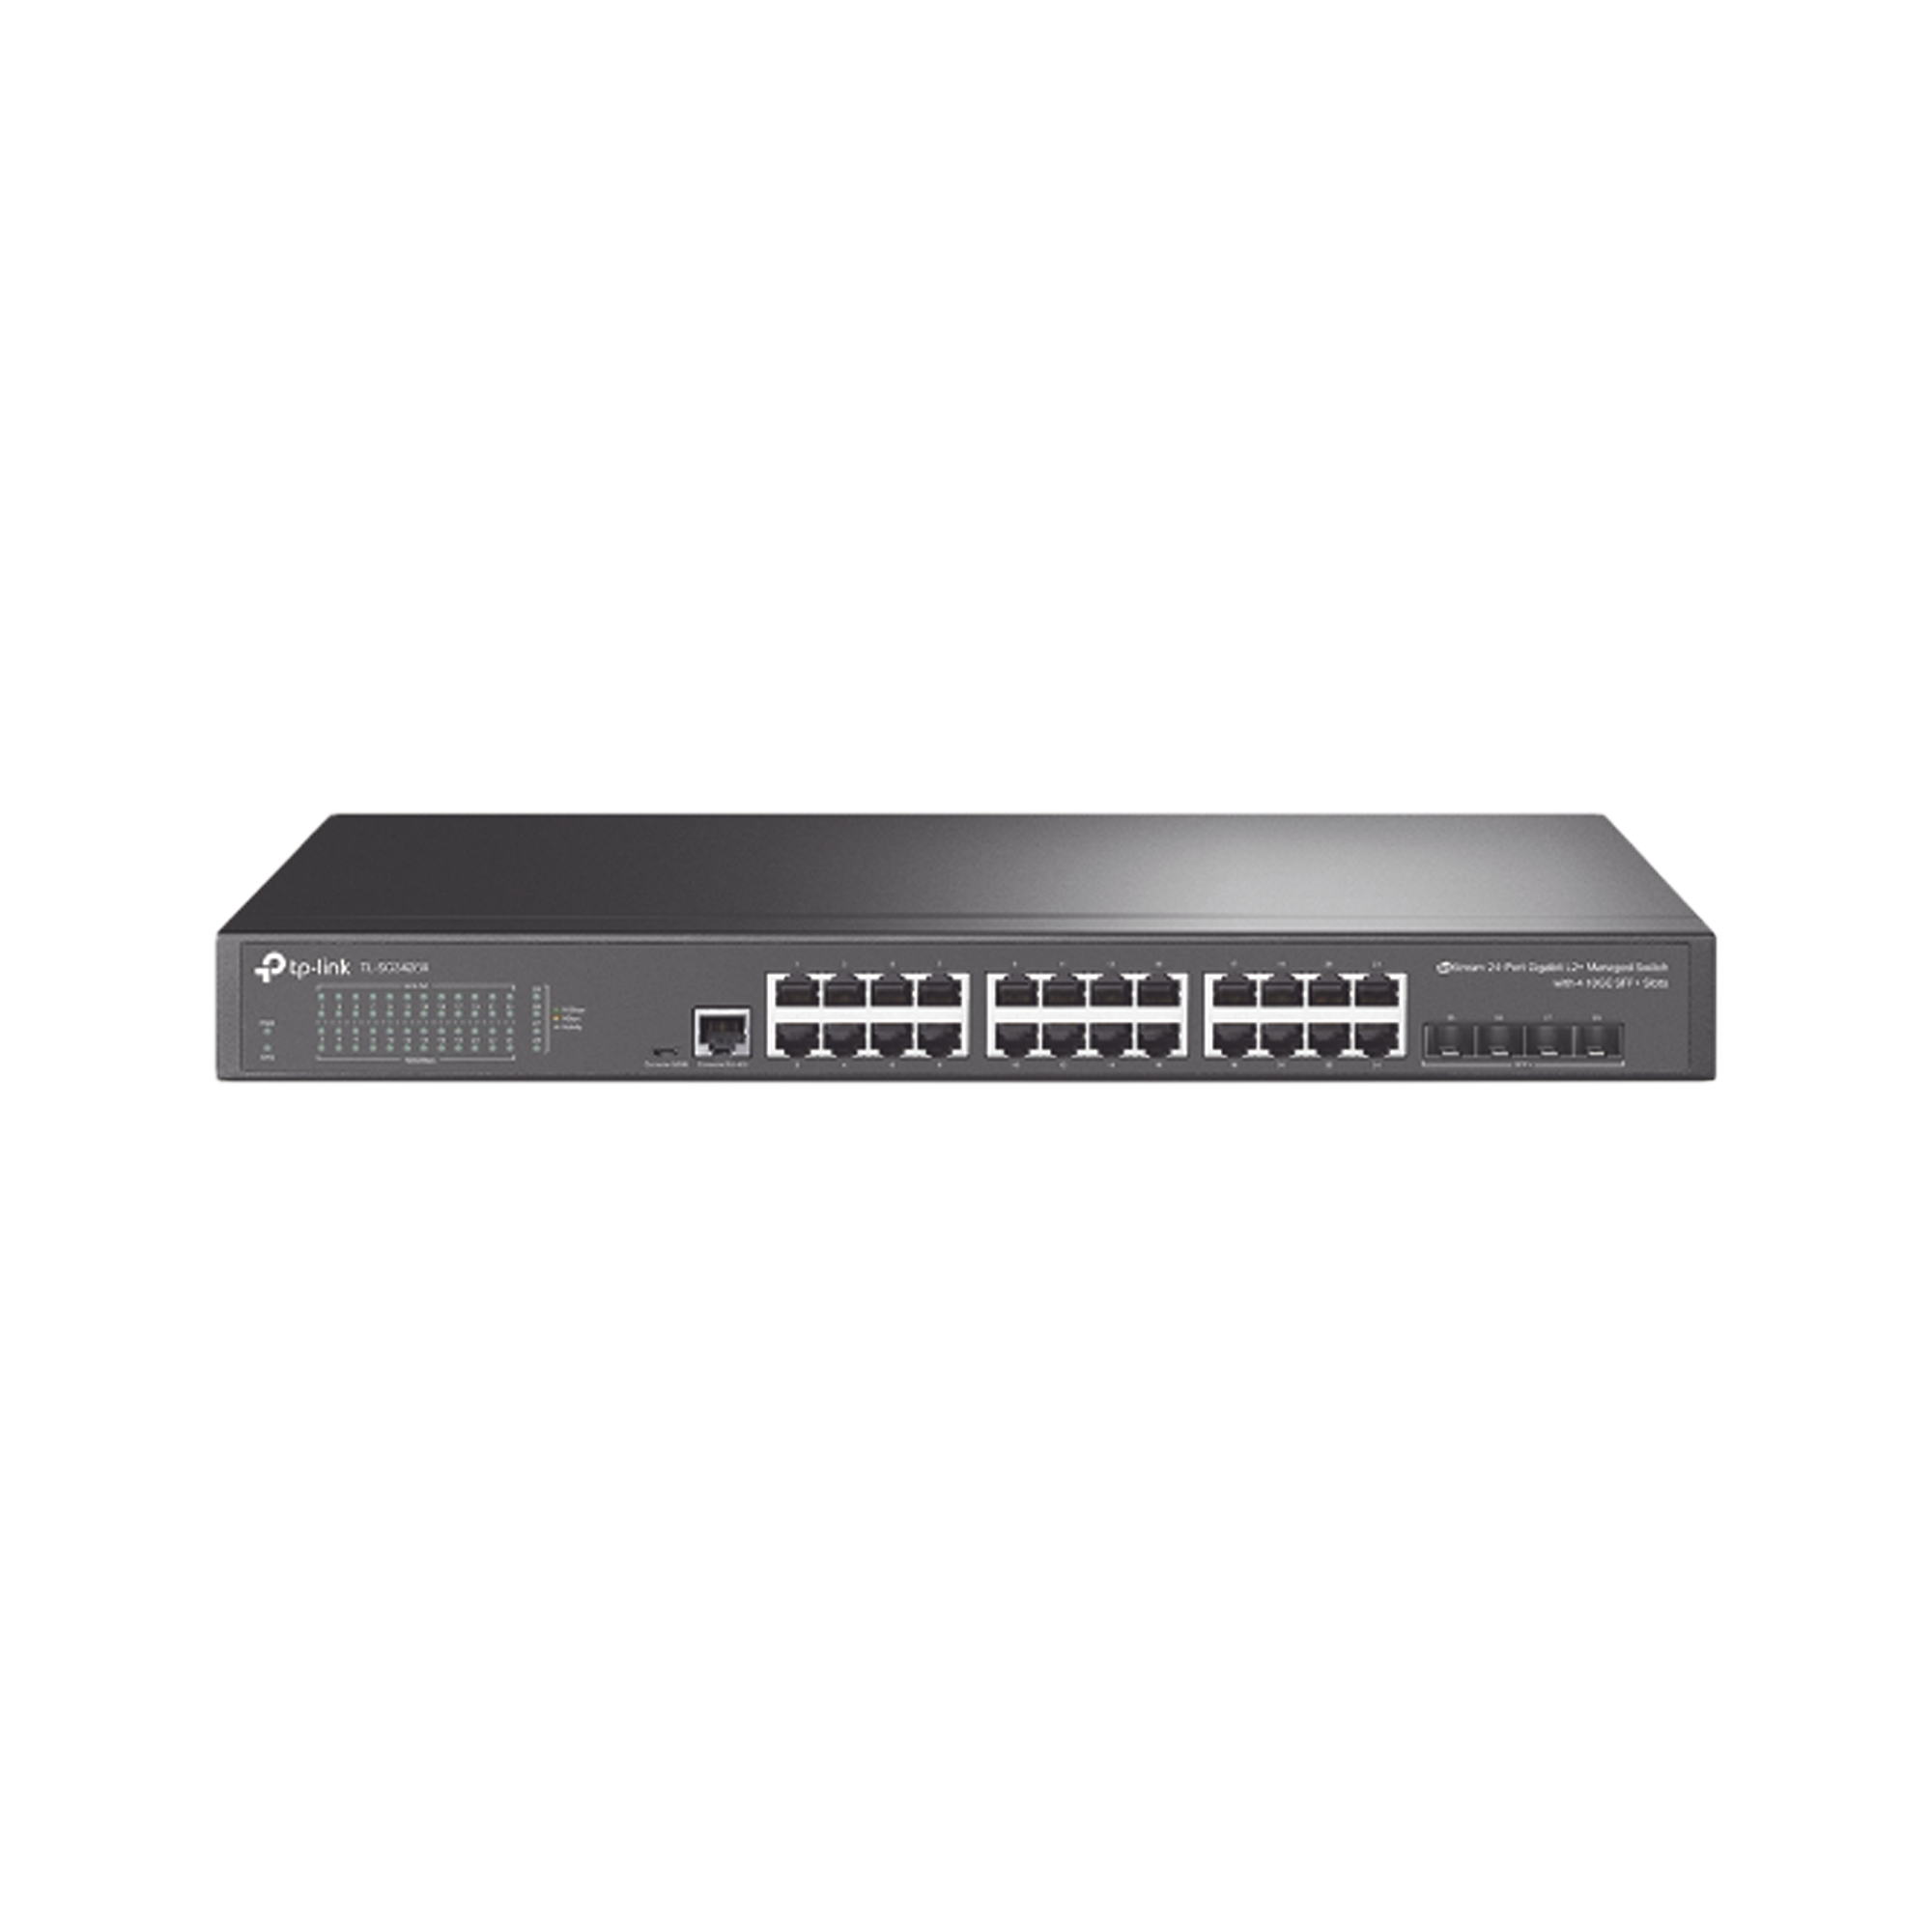 Switch JetStream SDN Administrable 24 puertos 10/100/1000 Mbps + 4 puertos SFP+, administracion centralizada OMADA SDN